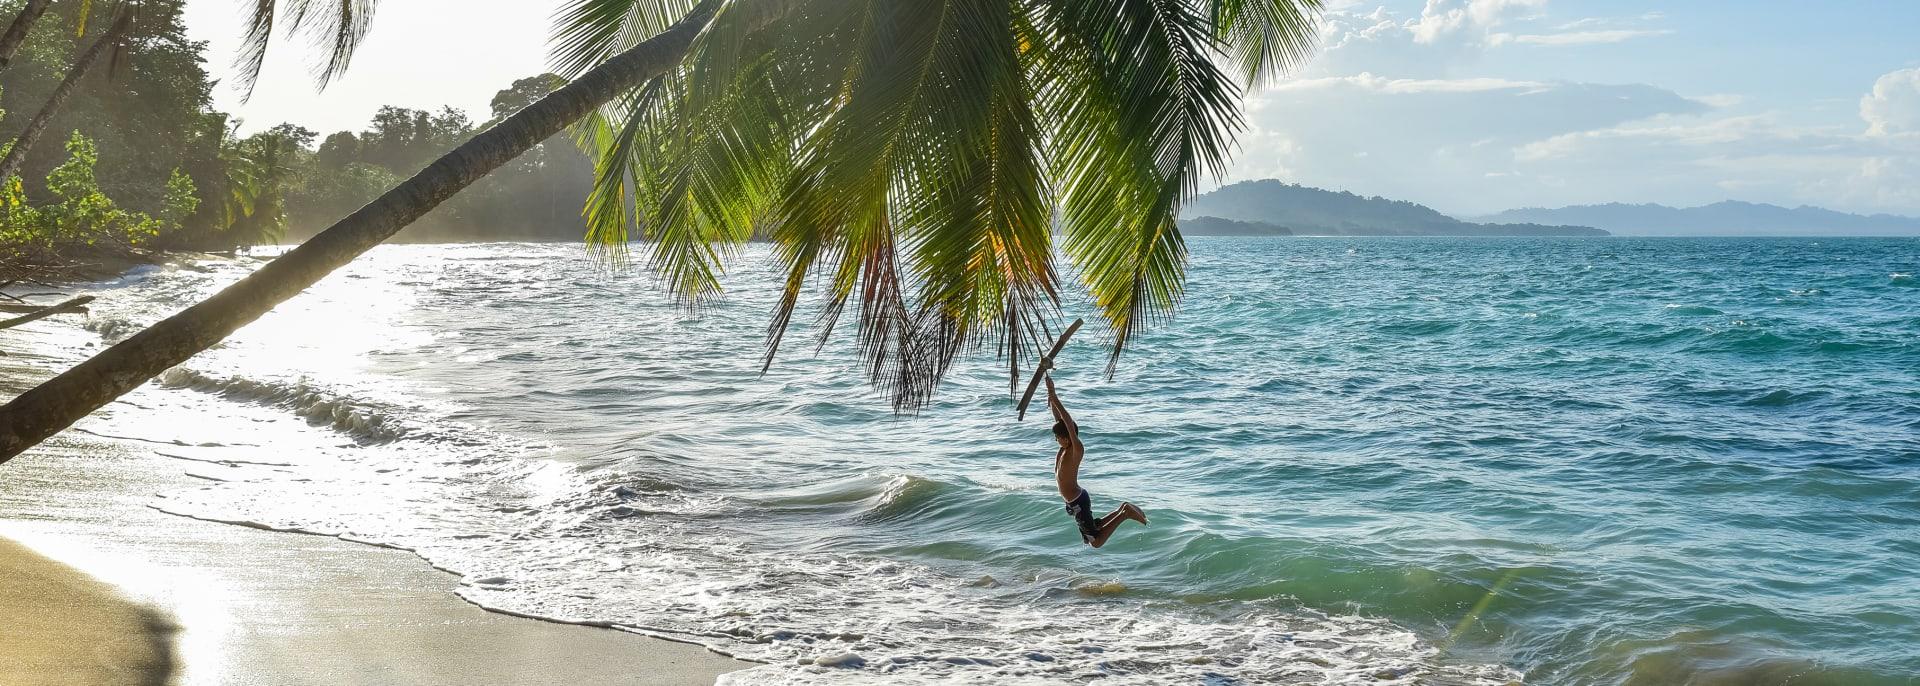 Strand von Punta Uva, Costa Rica